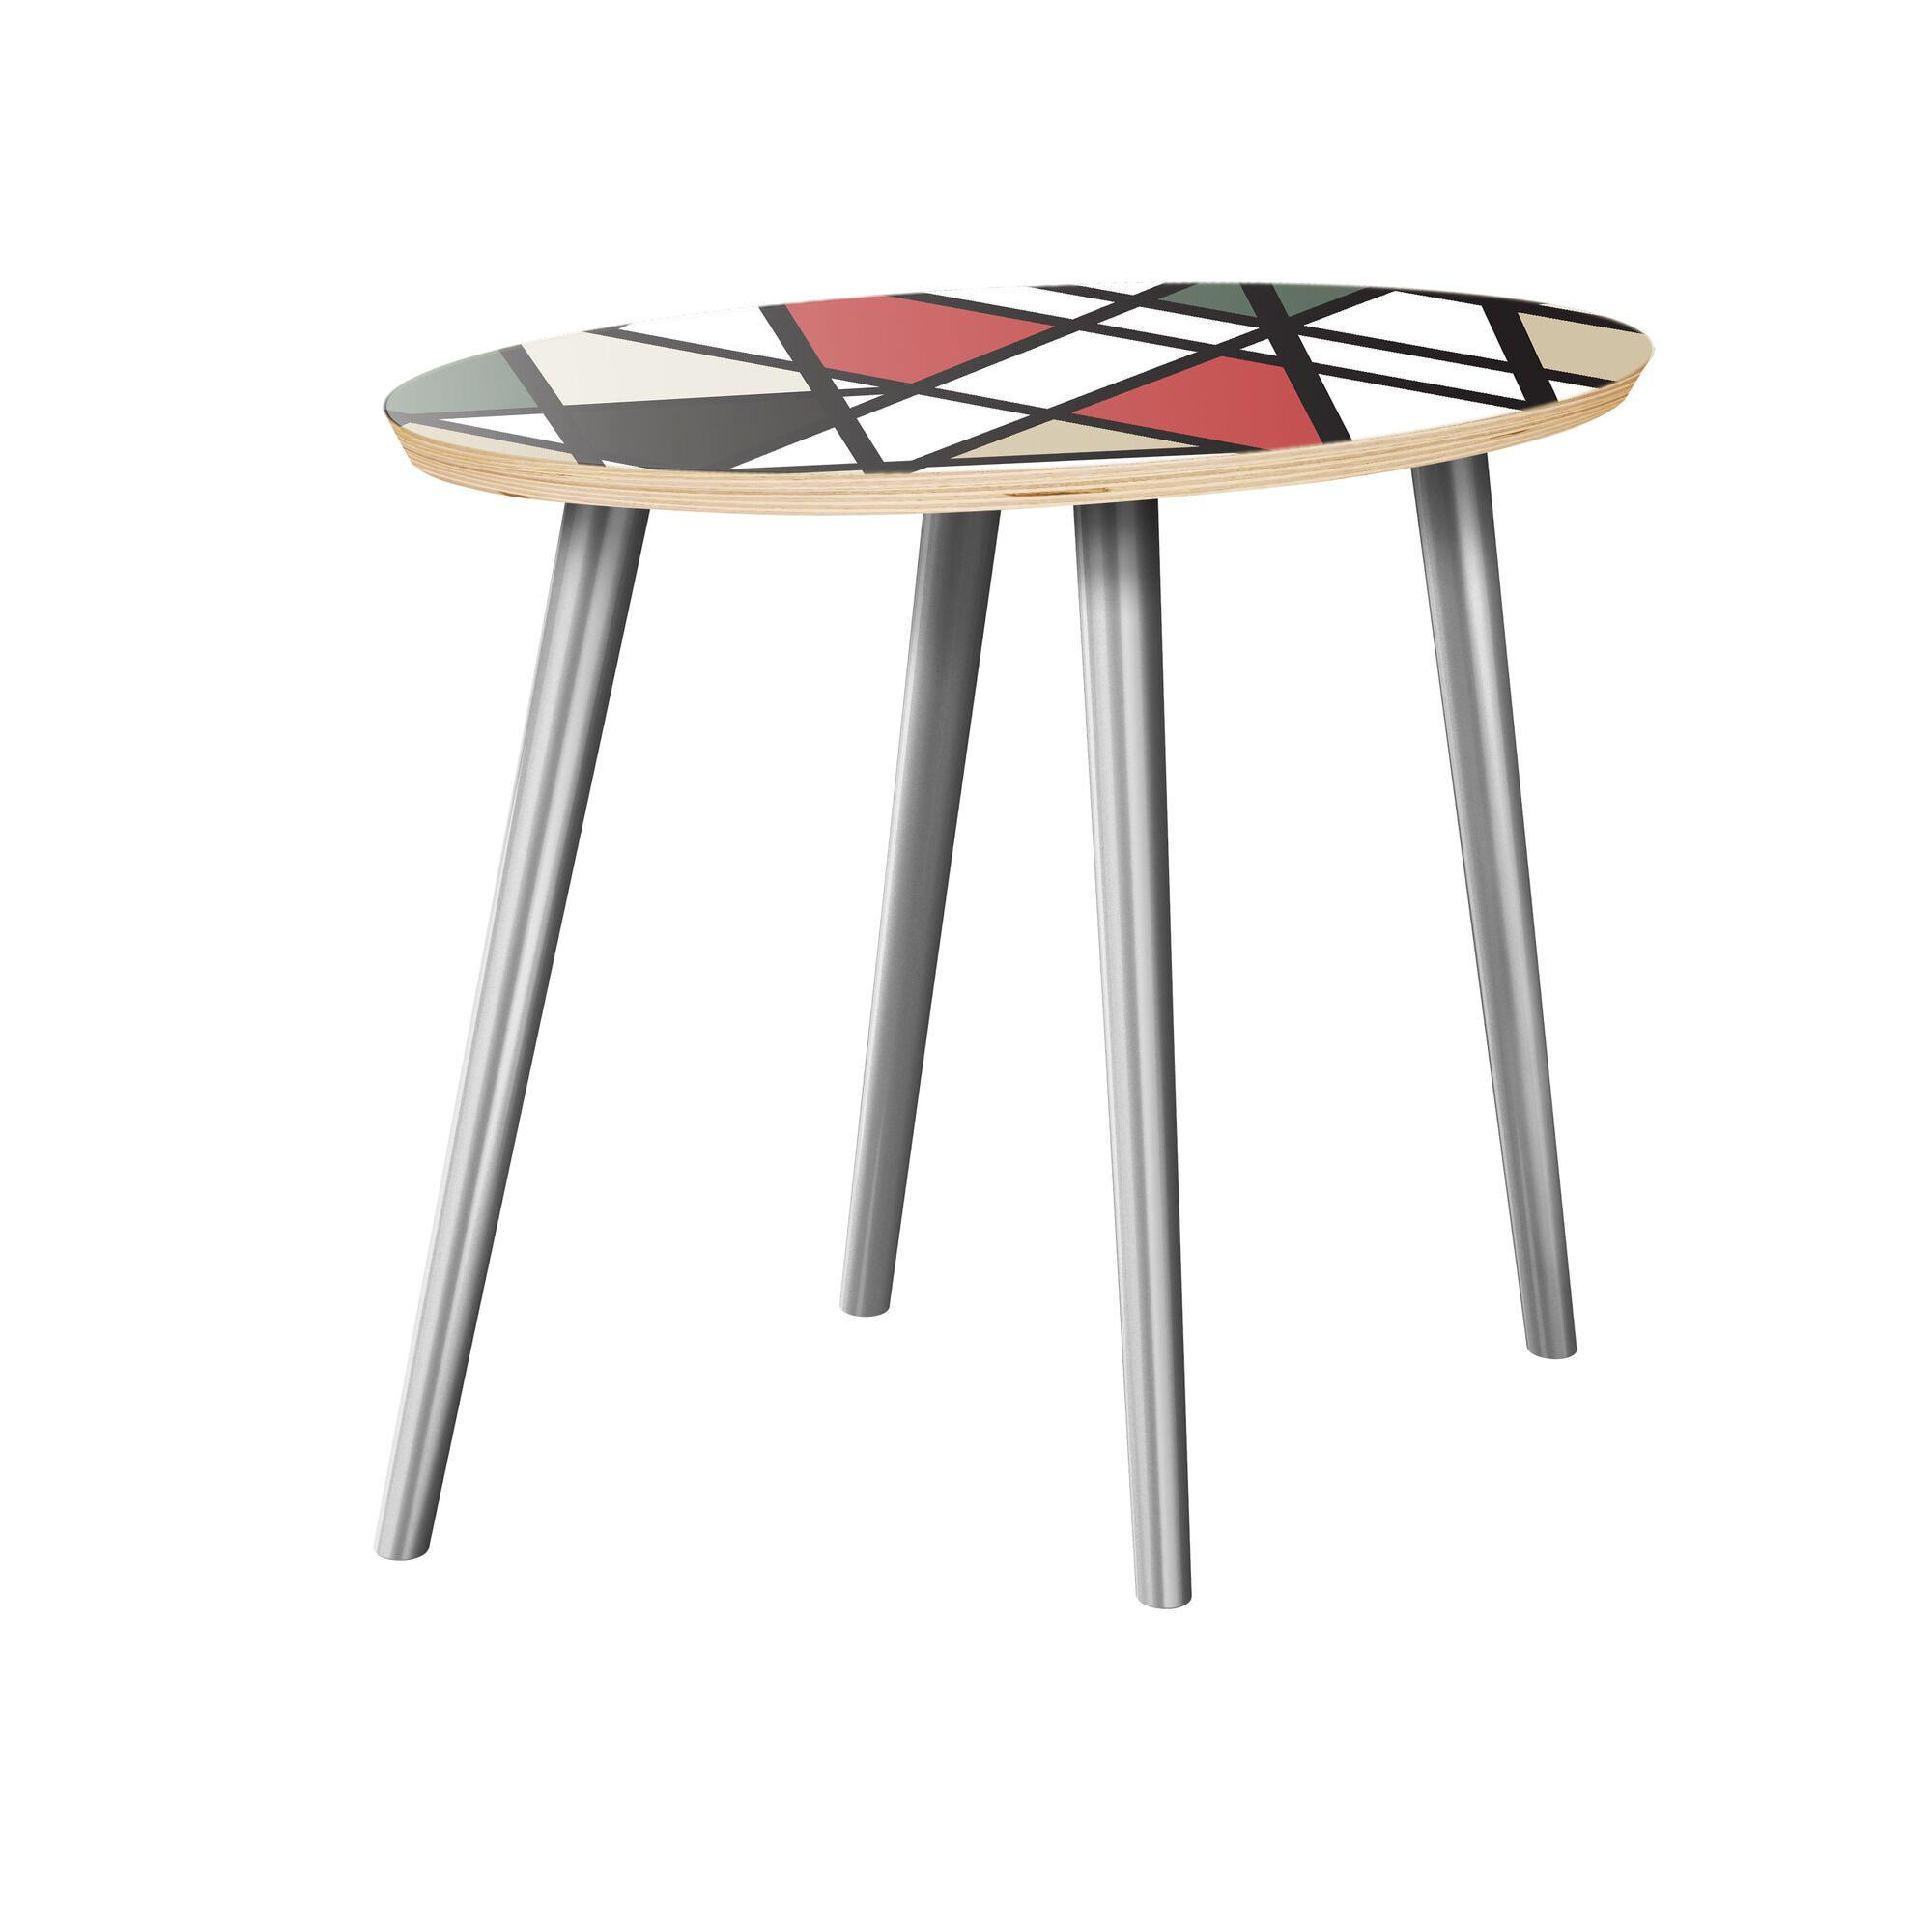 Jodi End Table Table Top Color: Natural, Table Base Color: Chrome